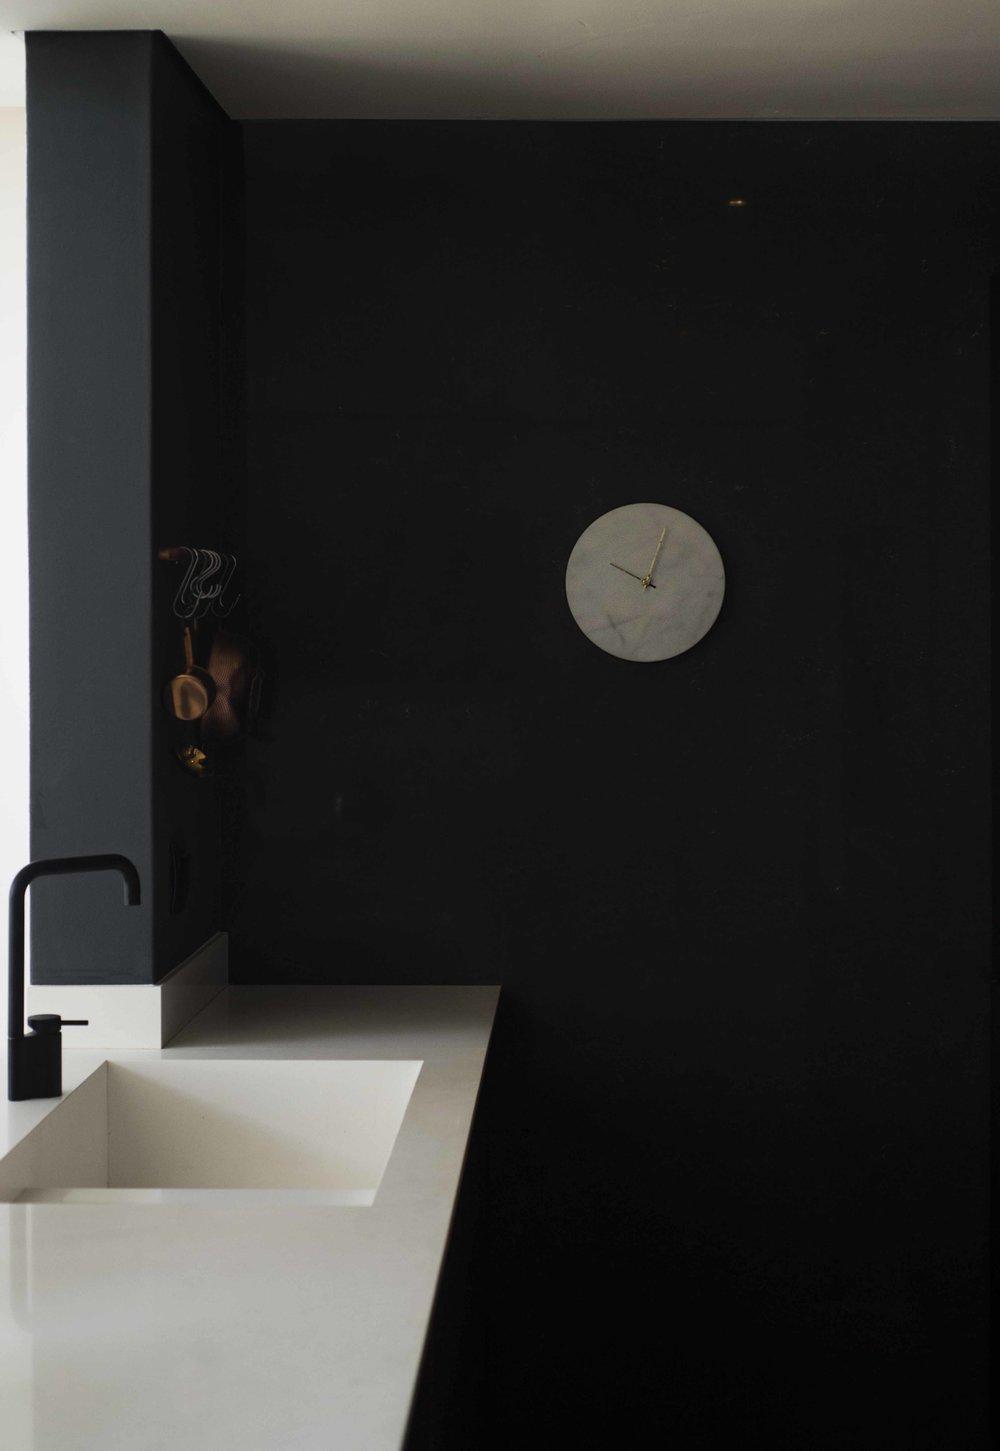 marble clock and dark wall panel